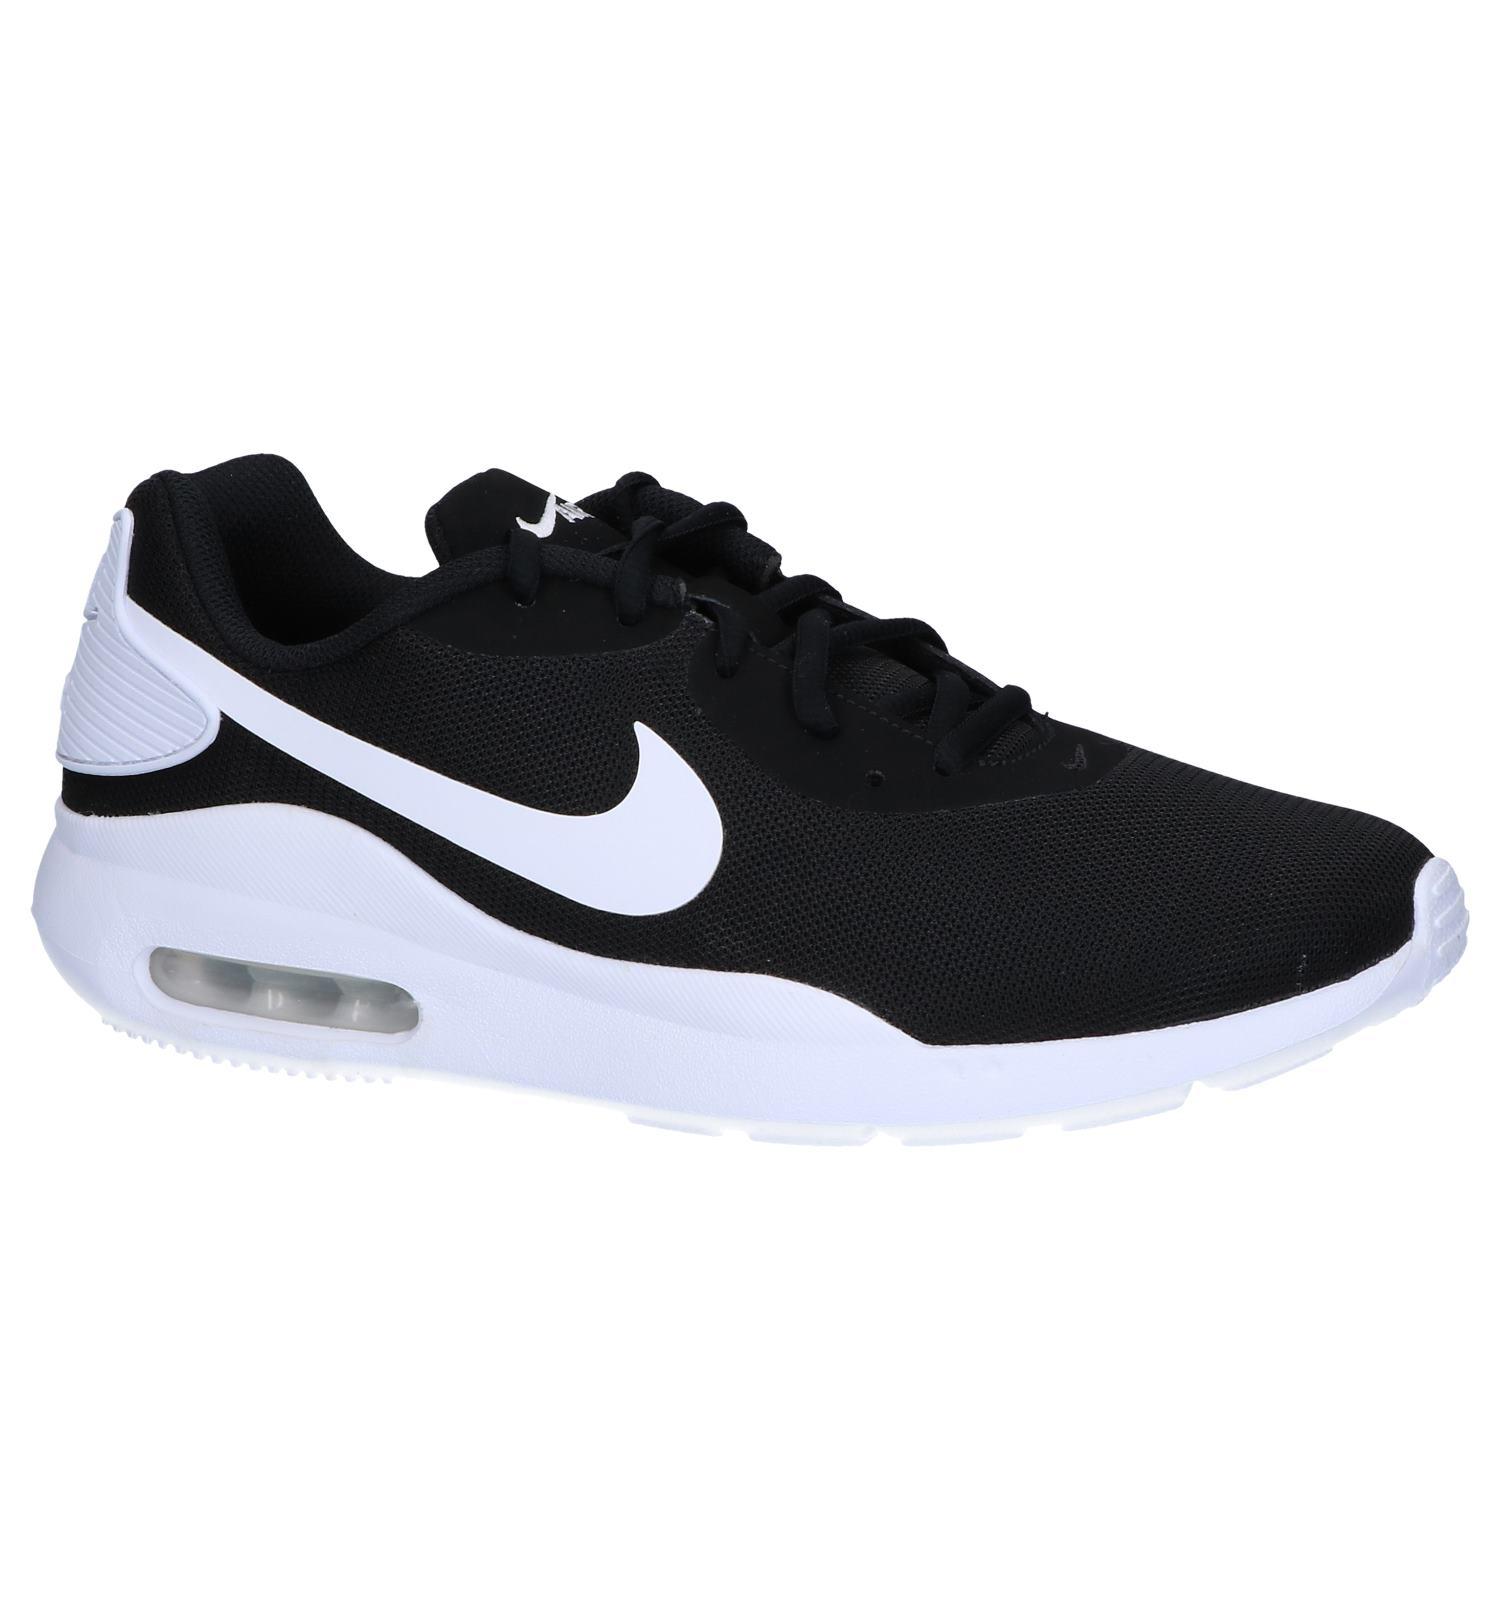 Zwarte Sneakers Nike Air Max Oketo | SCHOENENTORFS.NL | Gratis verzend en retour